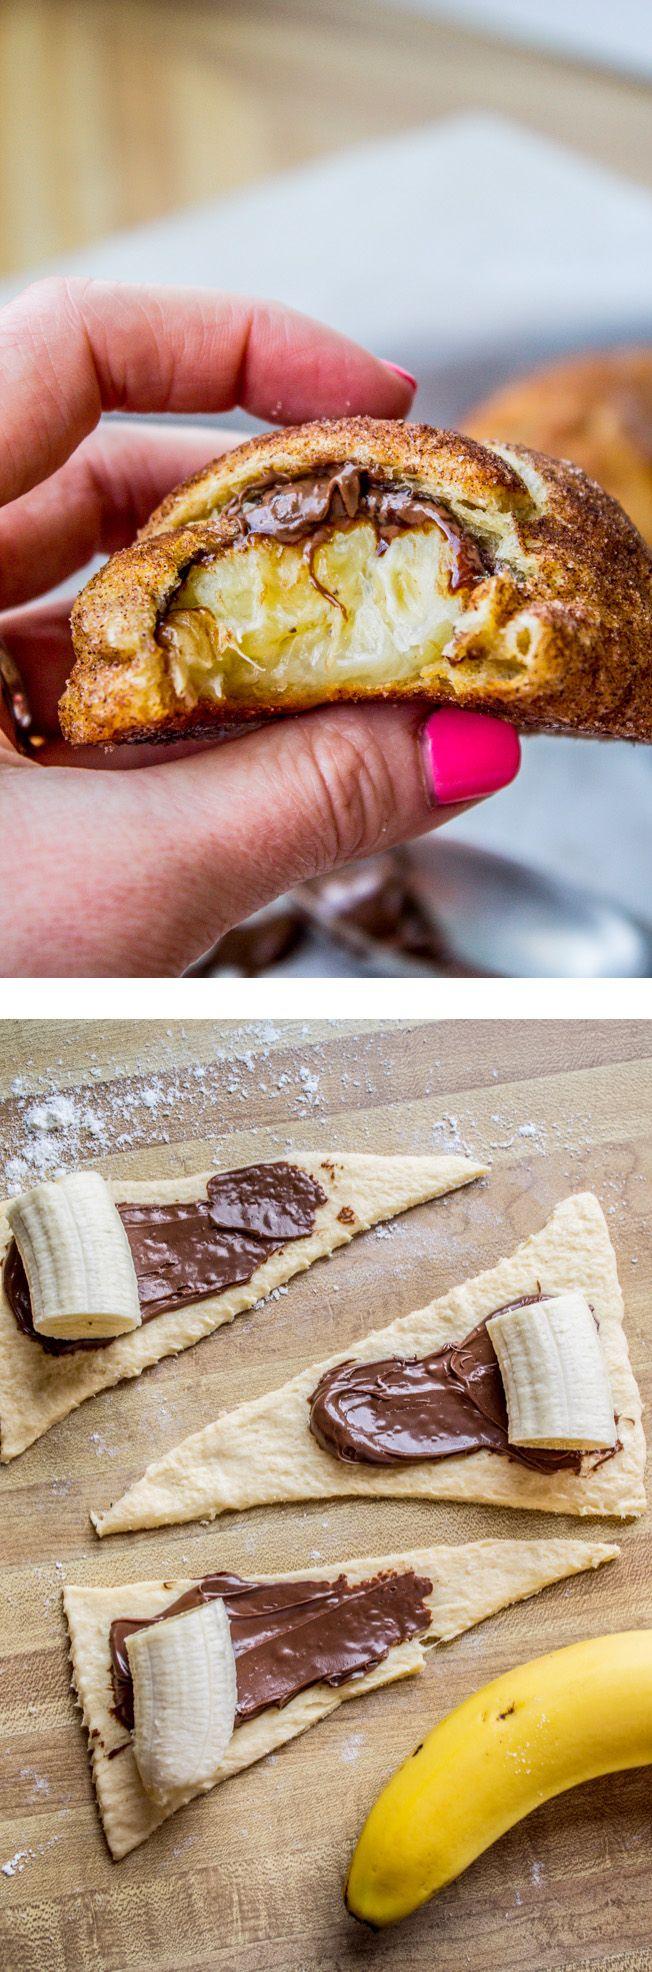 Nutella and Banana Stuffed Crescent Rolls